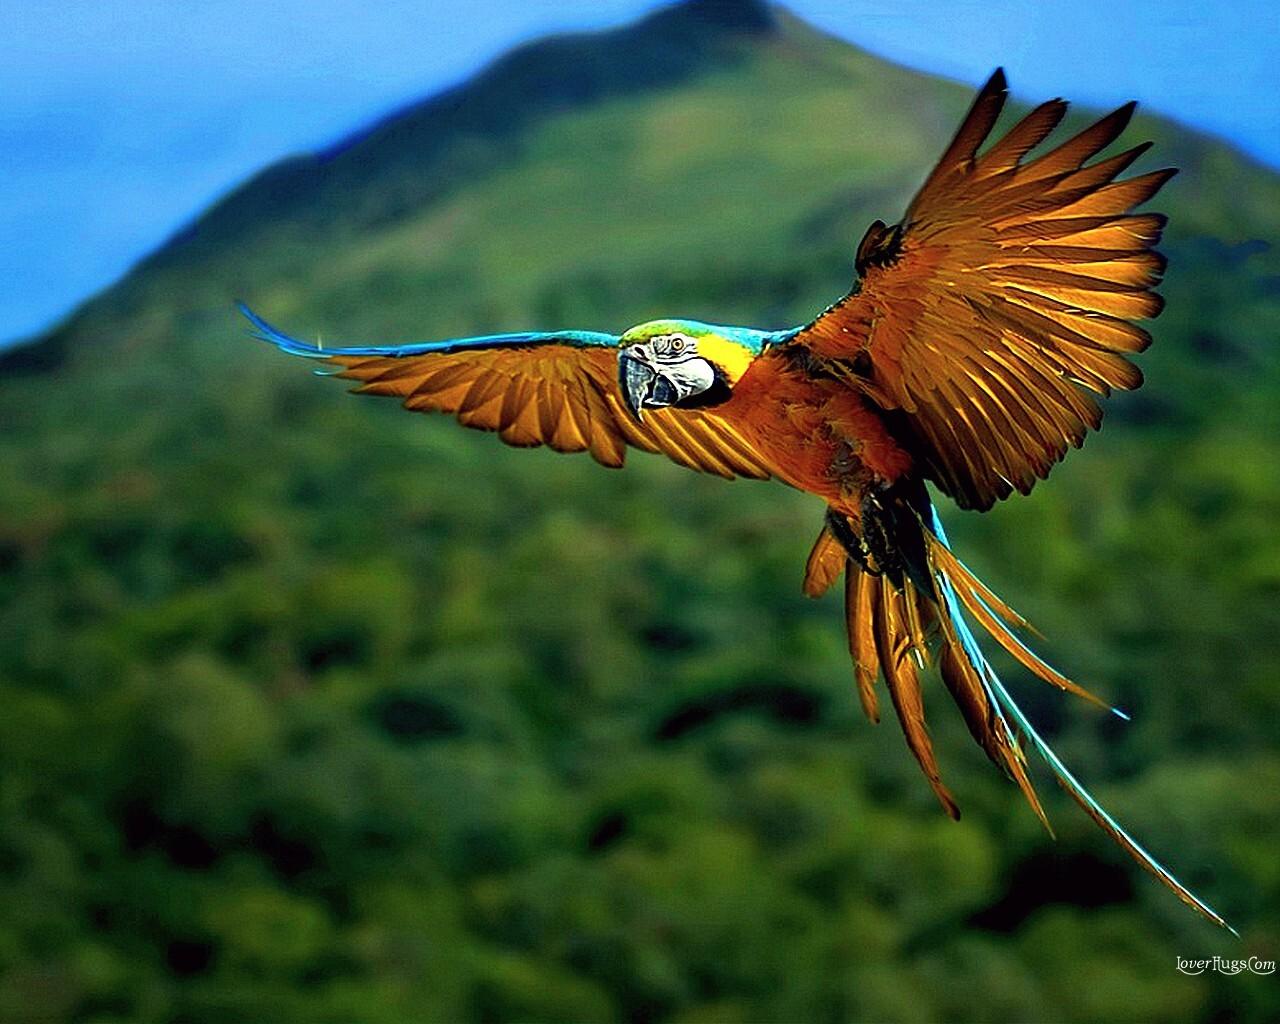 http://2.bp.blogspot.com/-4Sk9AHcCekY/T3TElkghO-I/AAAAAAAAG44/j_at6jLRfwA/s1600/Birds_9999530.jpg